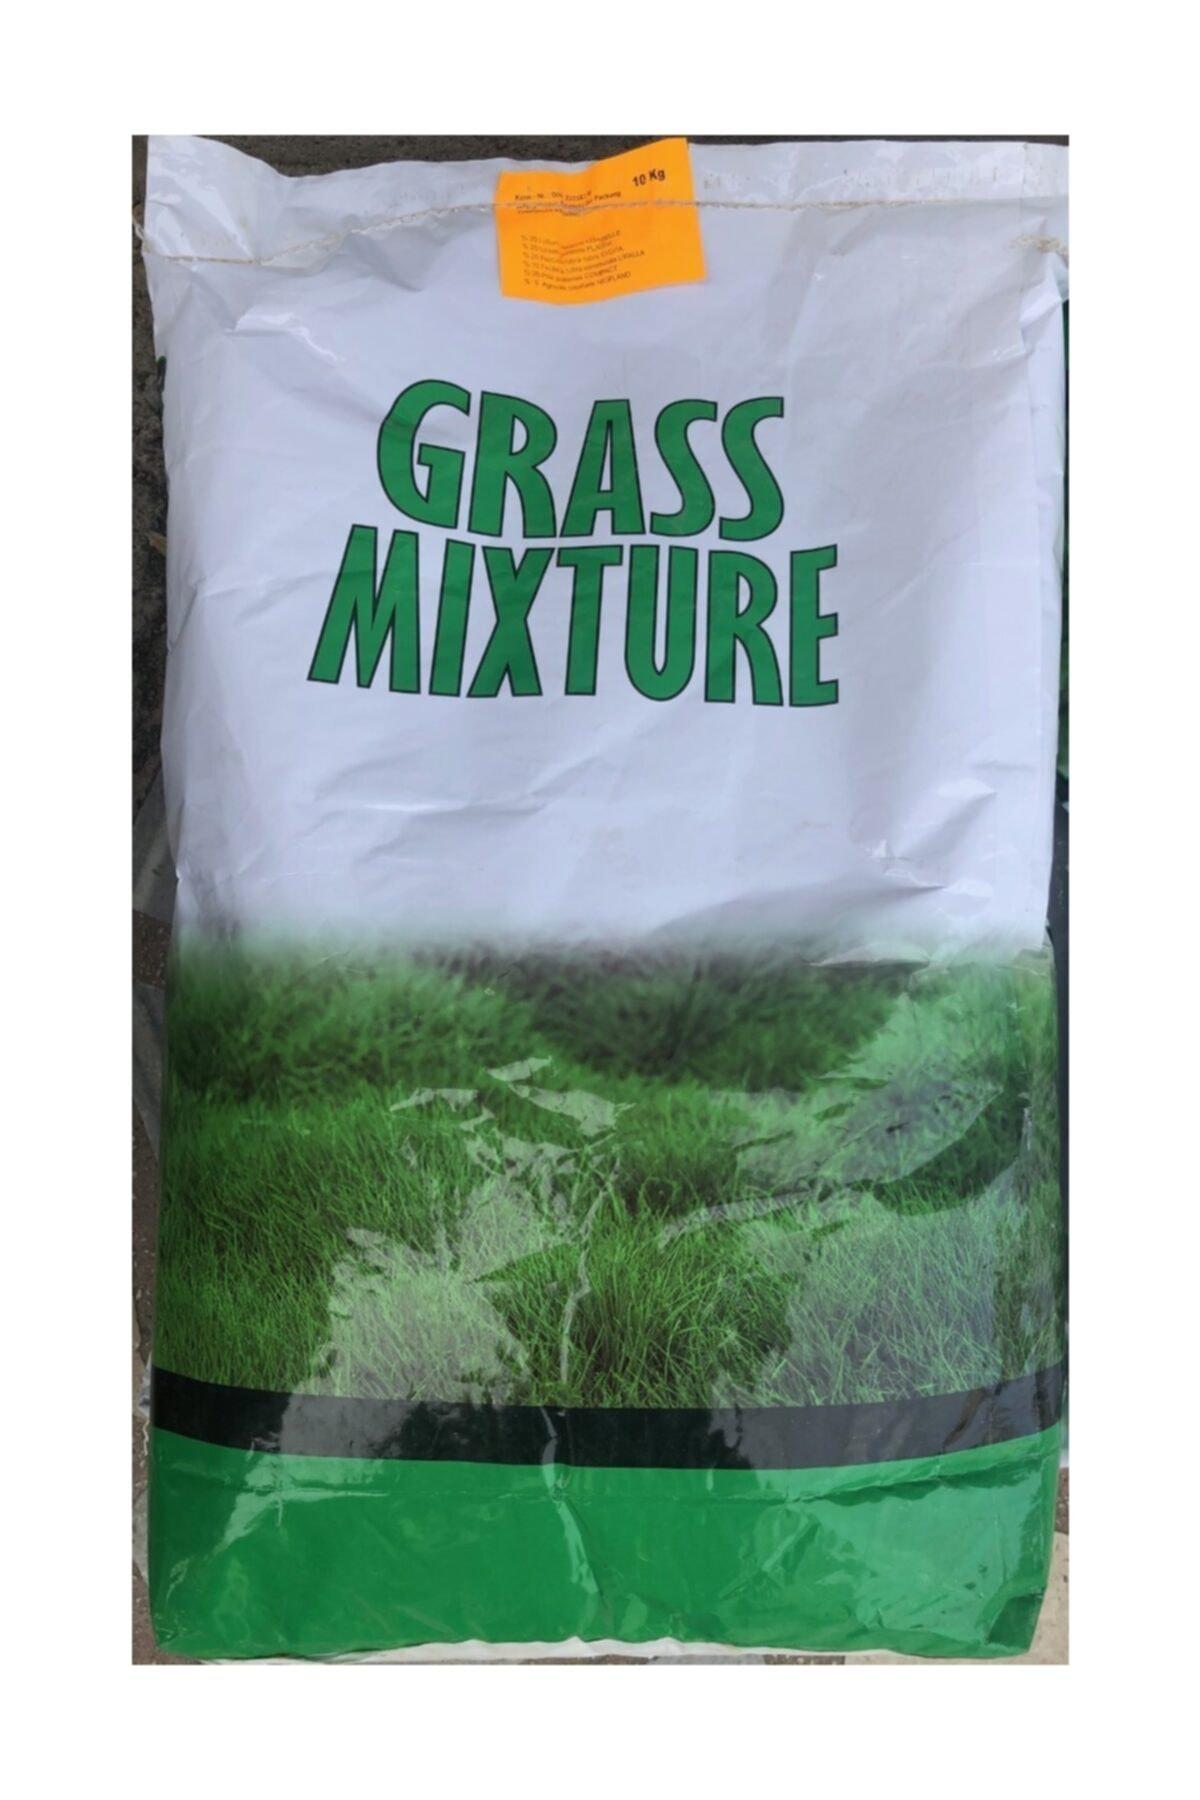 GRASS MIXTURE Çim Tohumu 10 Kg 6 Mix Altılı Karışım İthal Ot Çayır Tohum 1